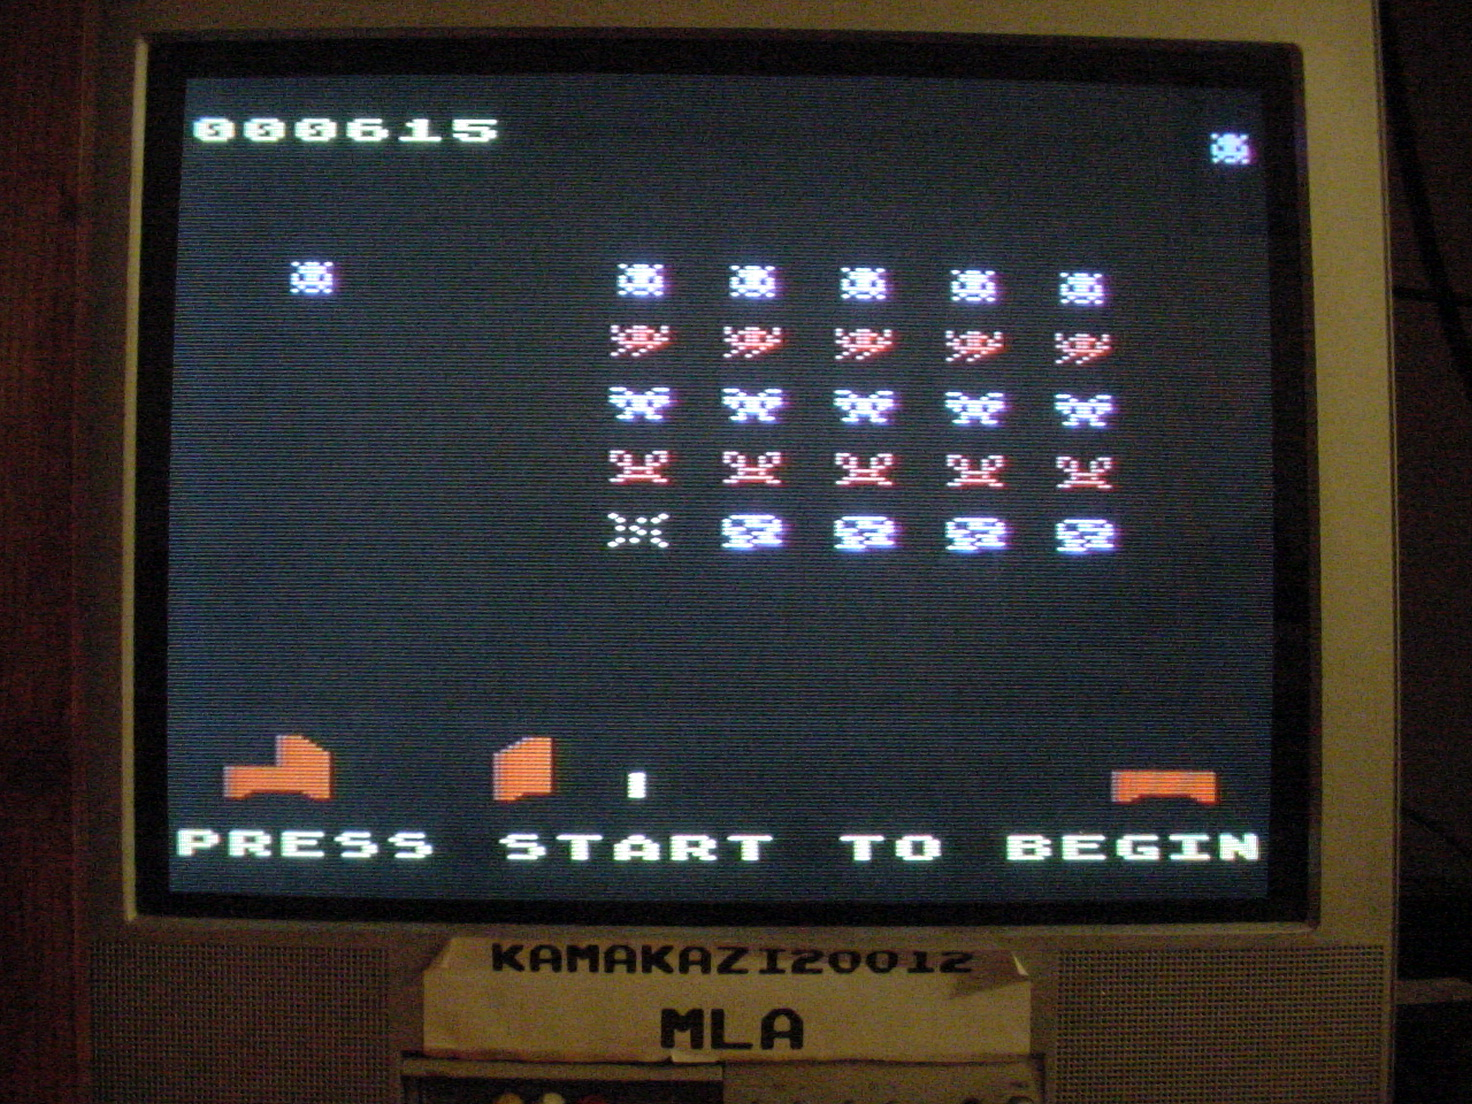 kamakazi20012: Invaders [Zong] (Atari 400/800/XL/XE) 615 points on 2015-01-17 02:40:39